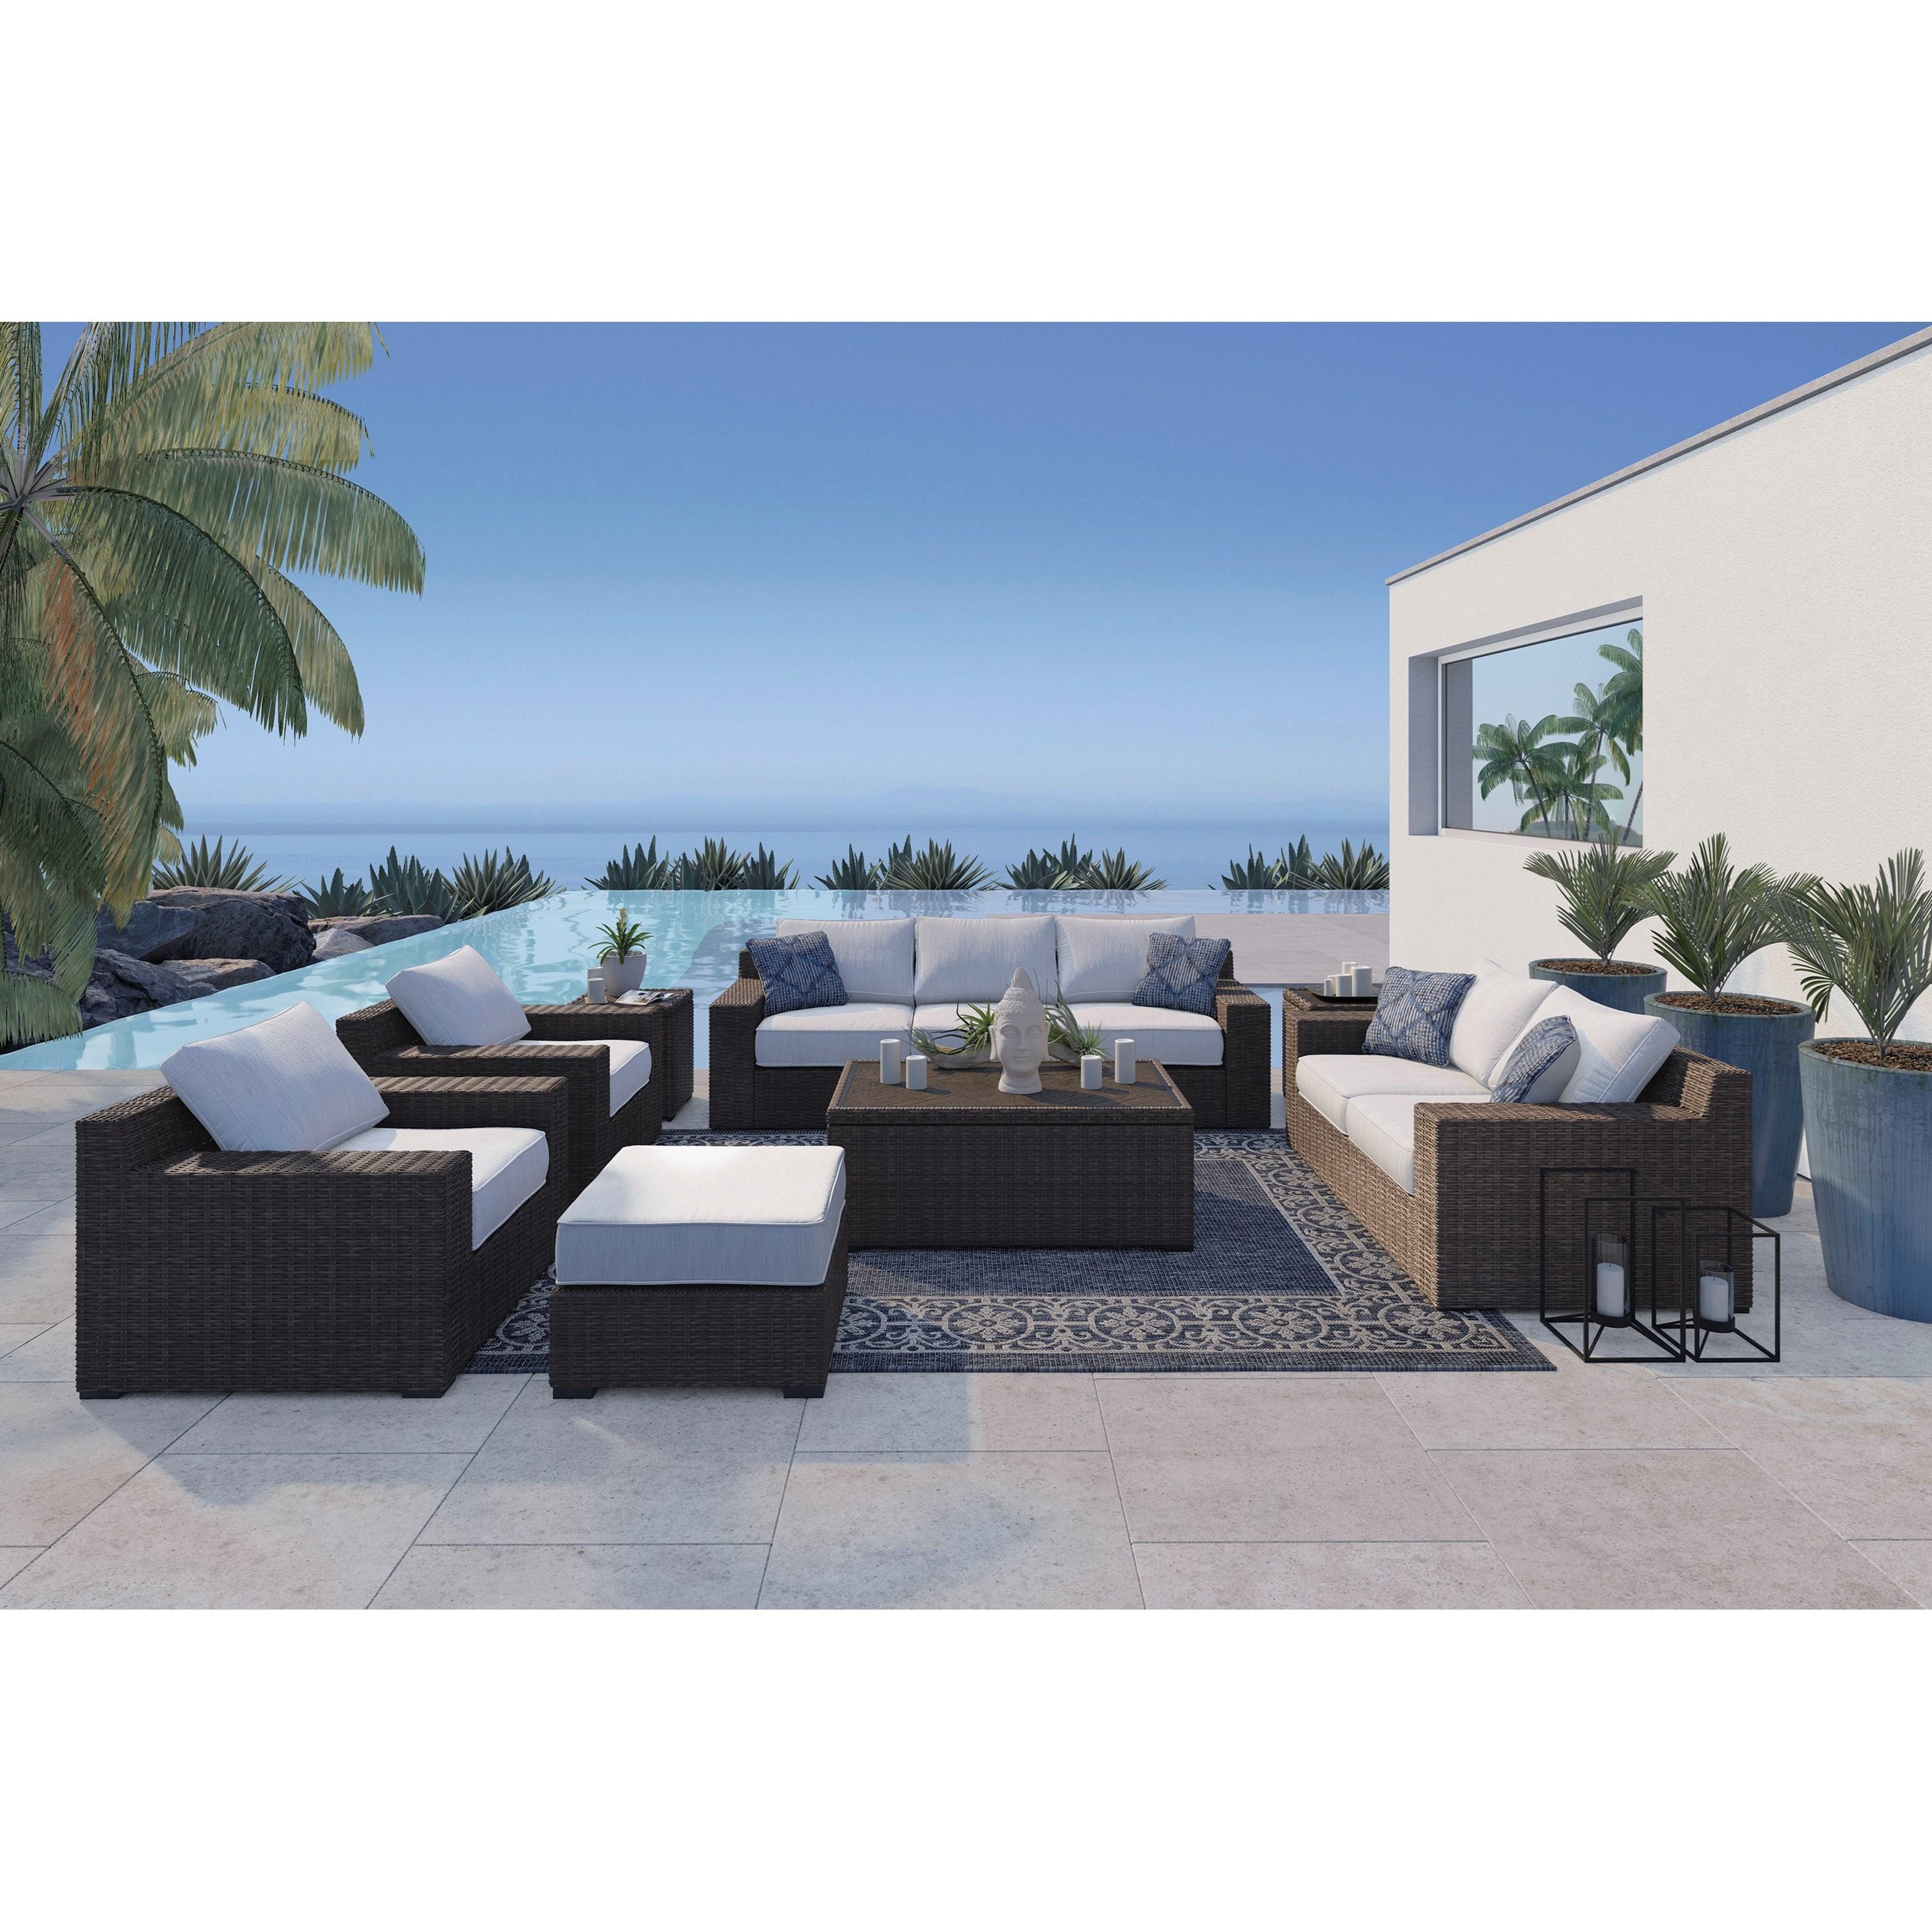 Signature Design by Ashley Alta Grande Outdoor Conversation Set - Item Number: P782-838+835+2x820+814+701+2x702